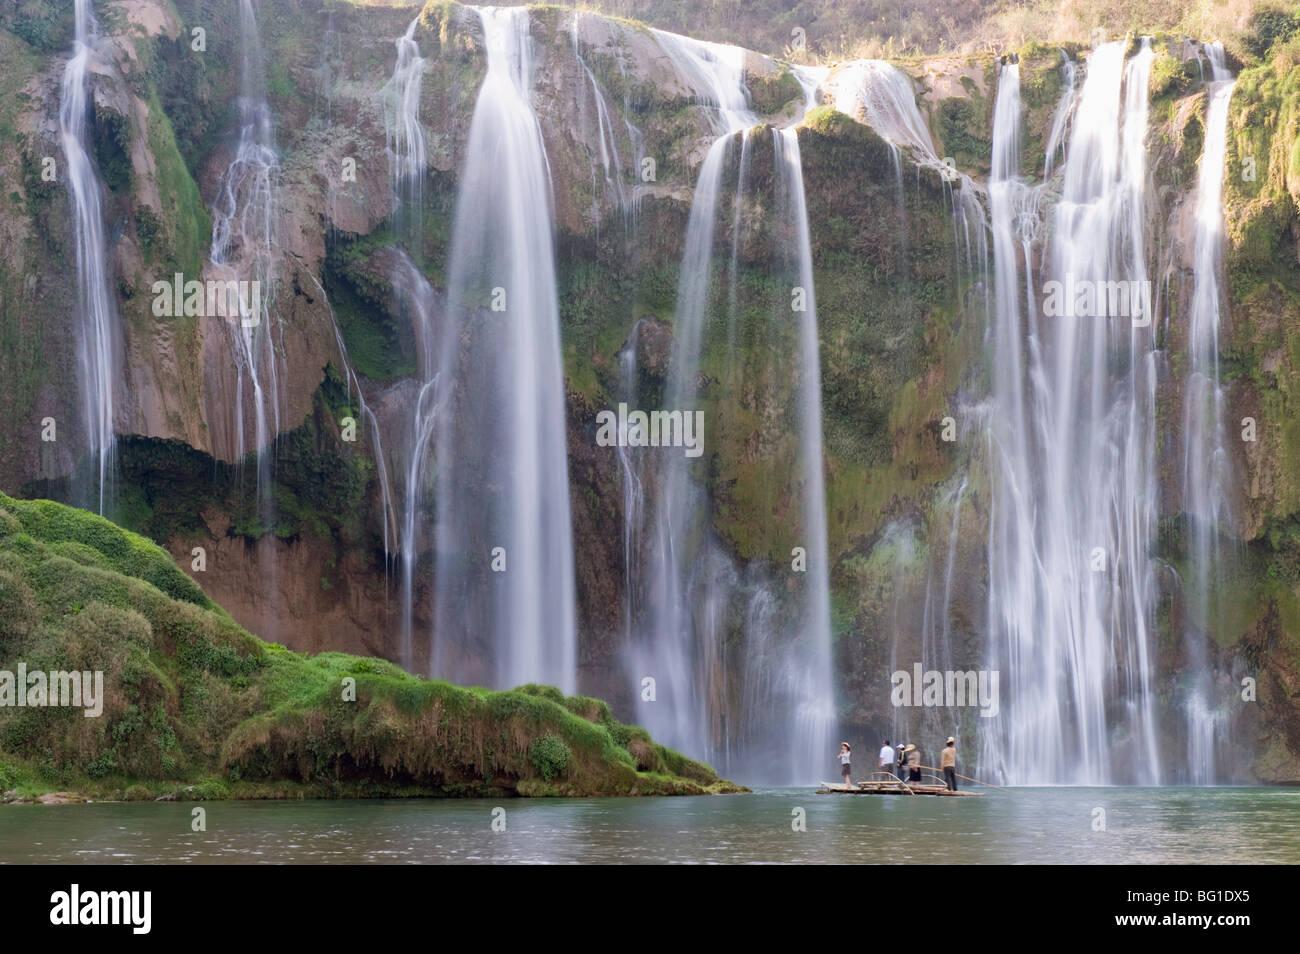 Tourists on a bamboo raft under Jiulong Falls (Nine Dragon waterfall), Luoping, Yunnan Province, China, Asia - Stock Image